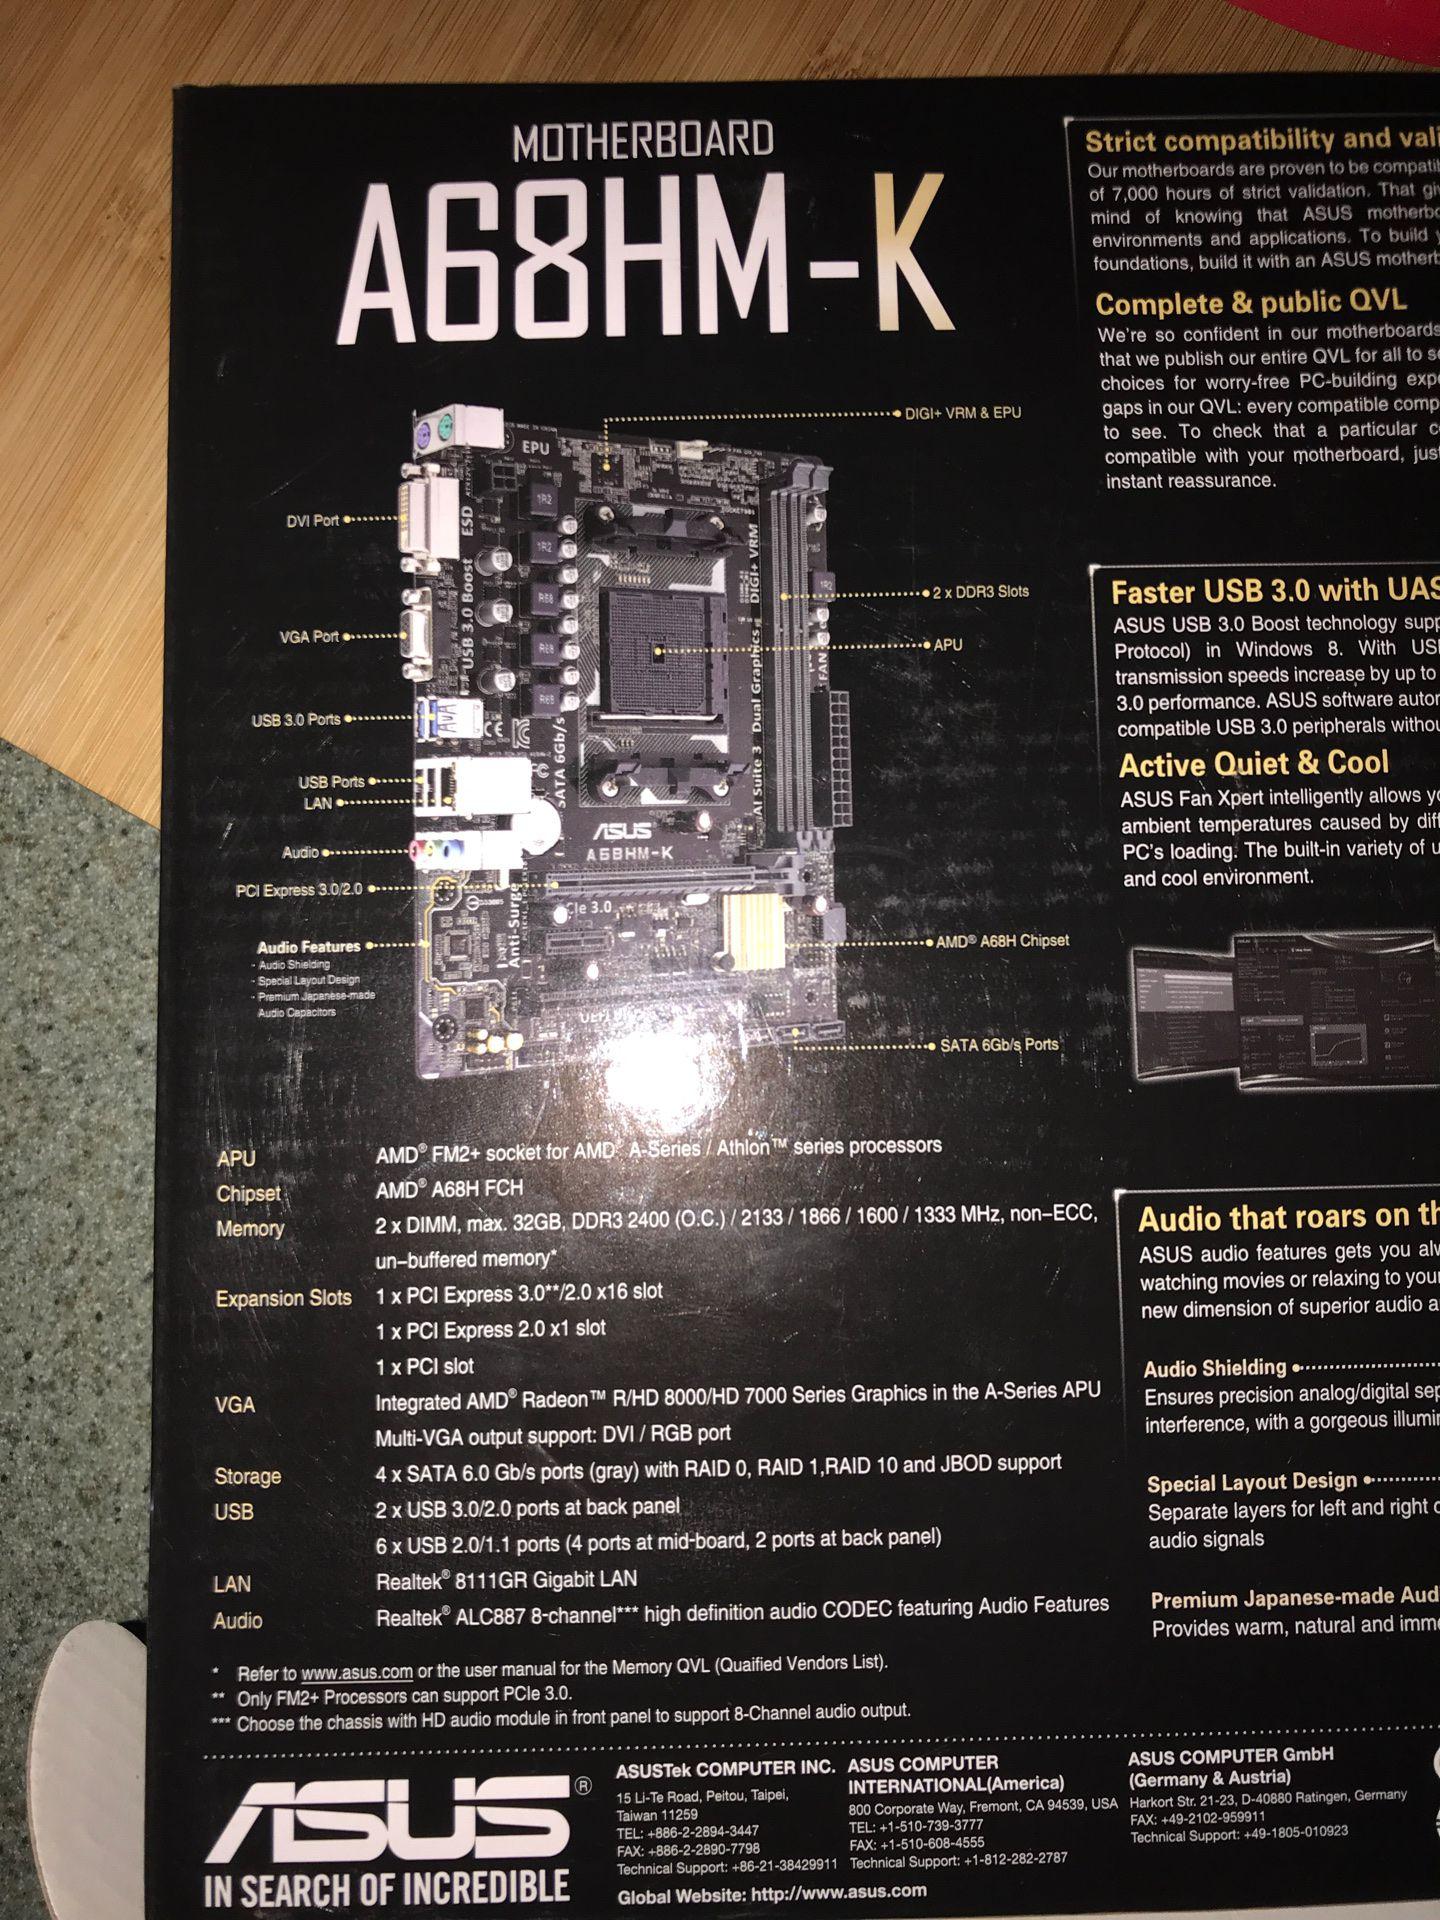 ASUS Motherboard (A68HM-K)